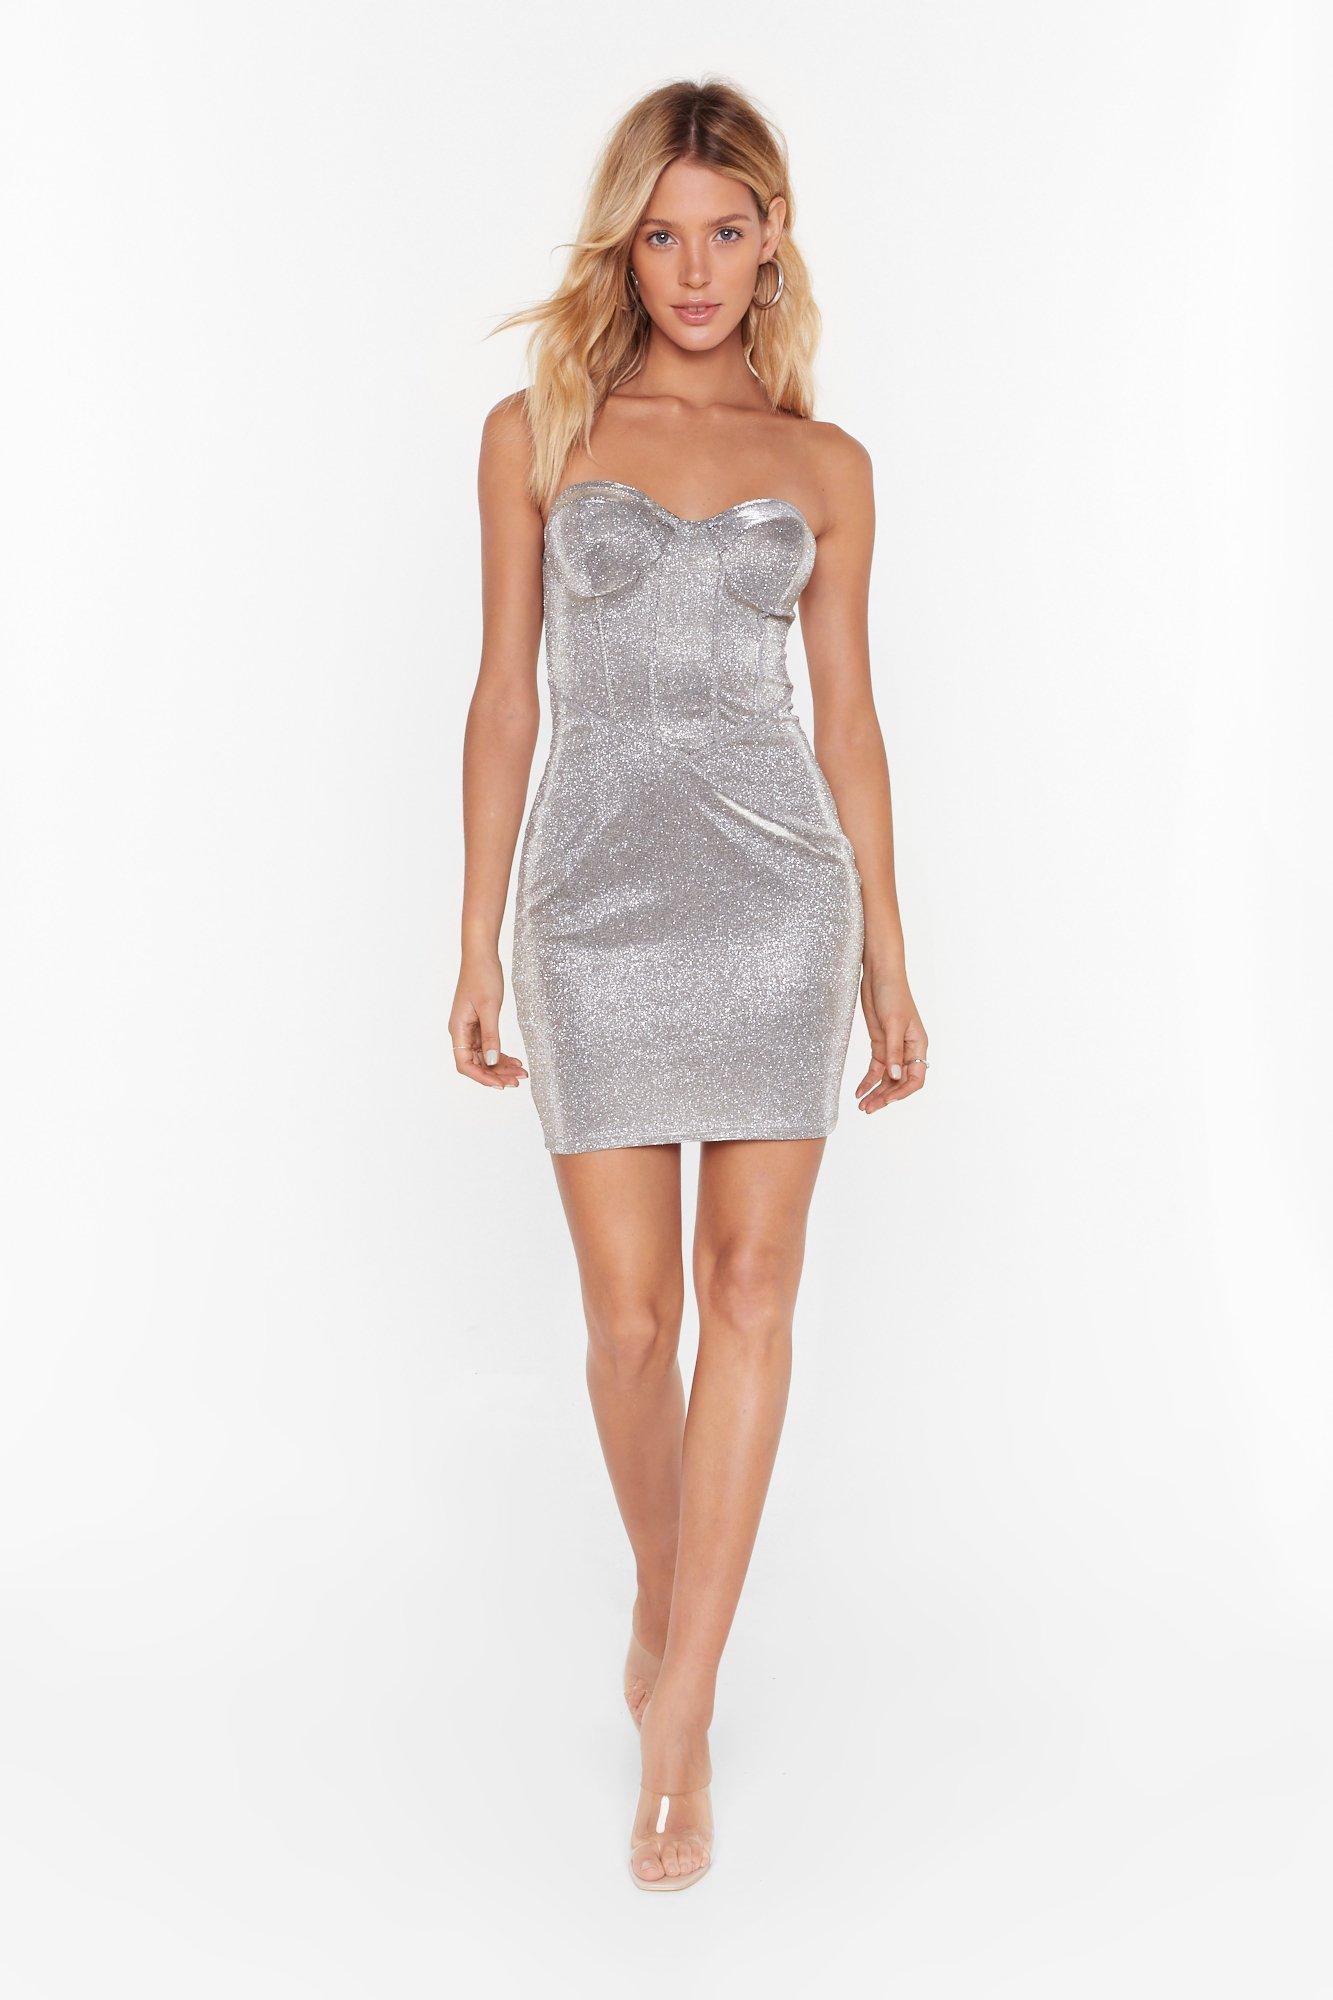 Image of My Mind's Corset On You Glitter Mini Dress